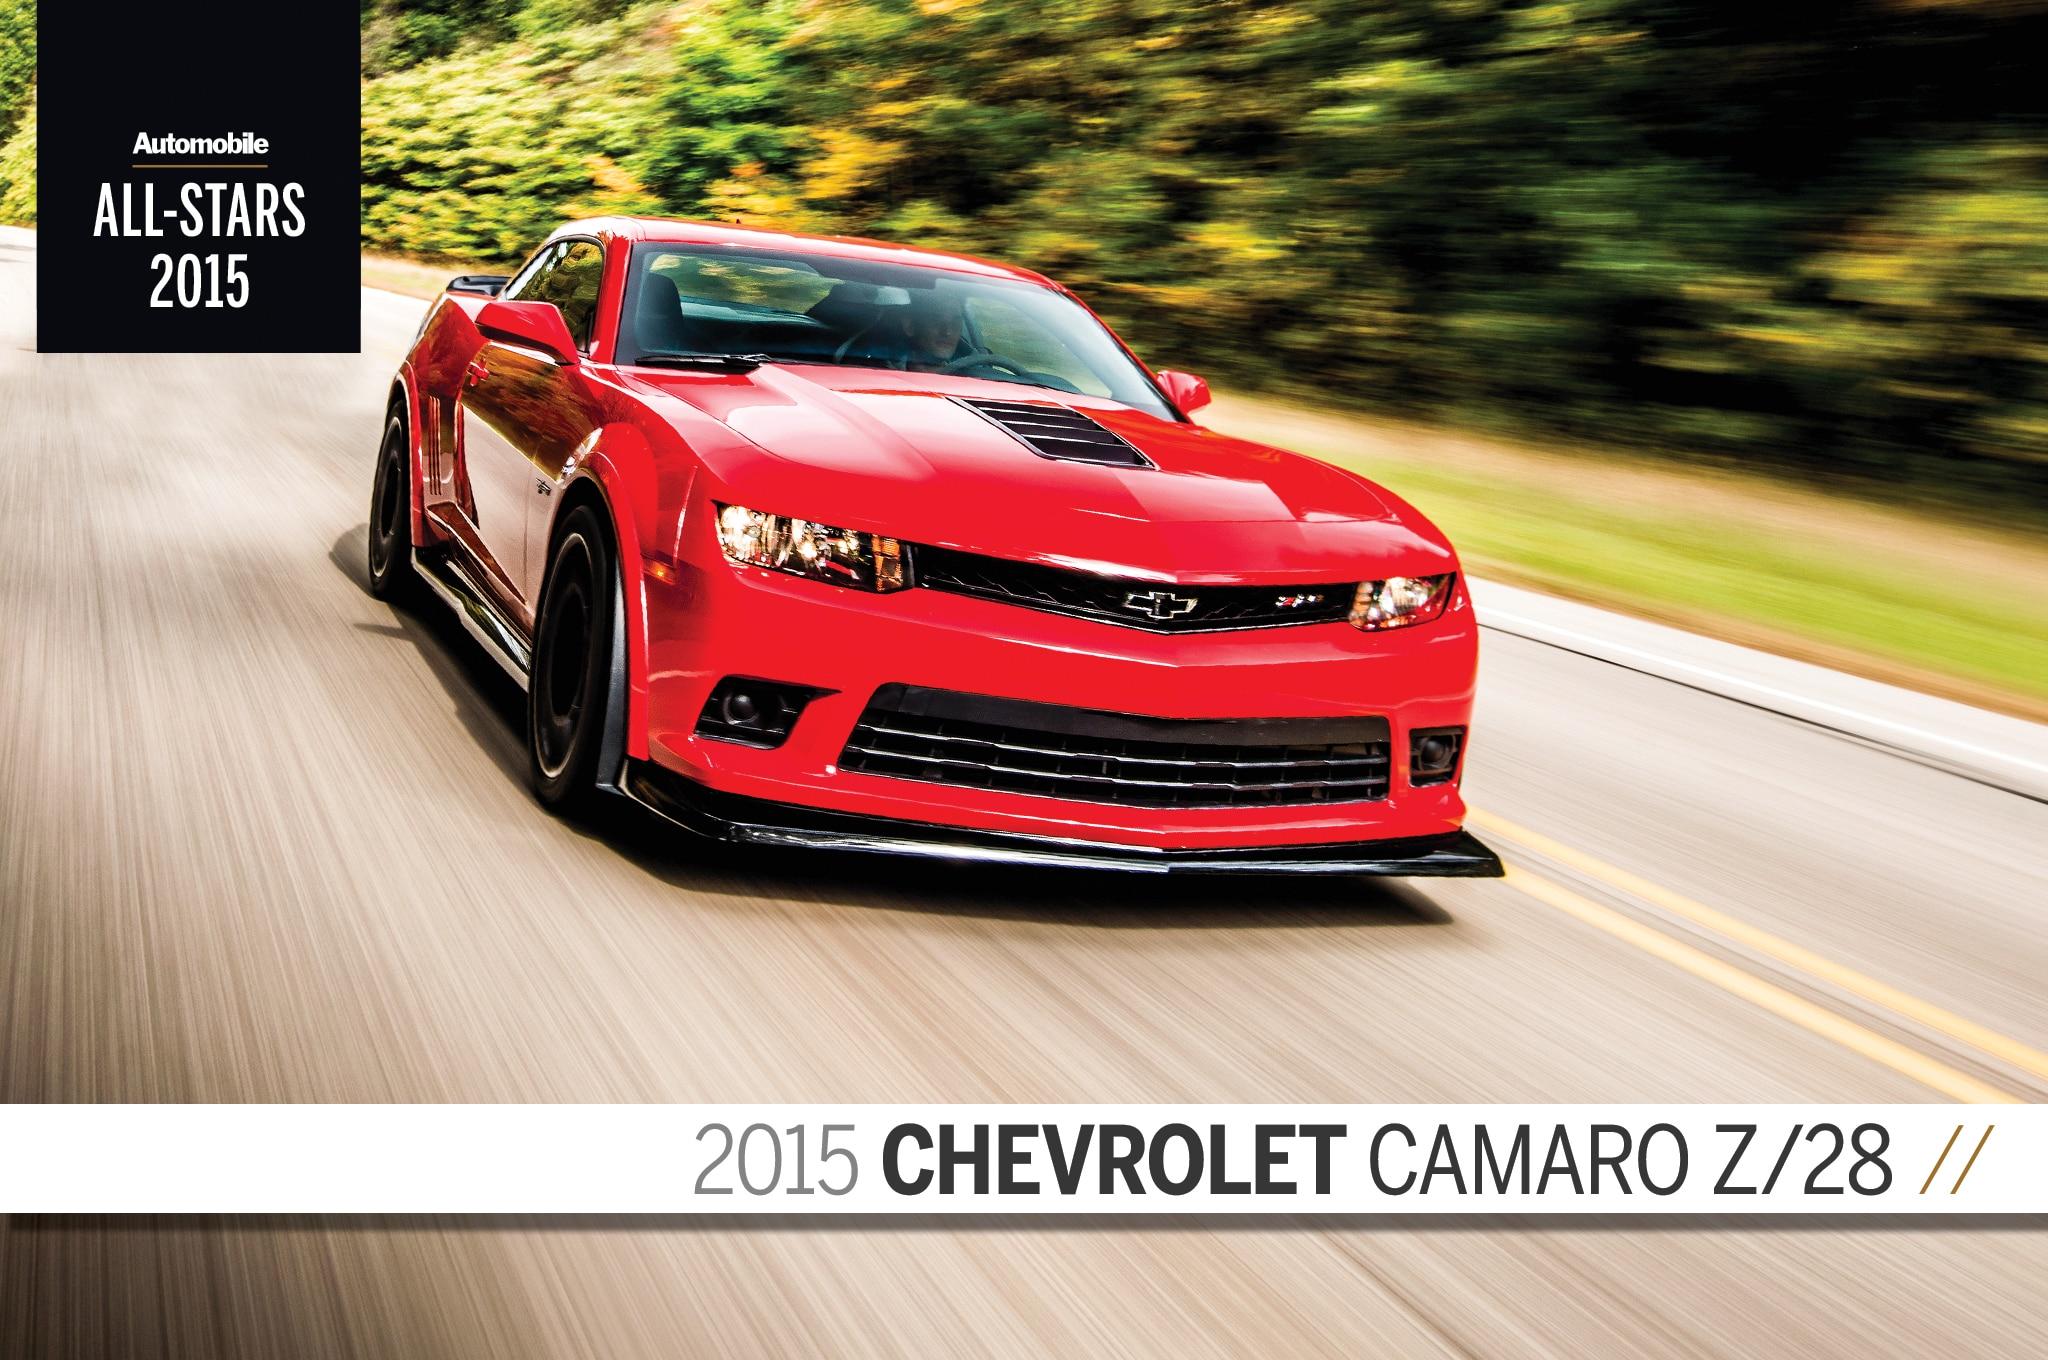 All Stars 2015 Chevrolet Camaro Z28 Final